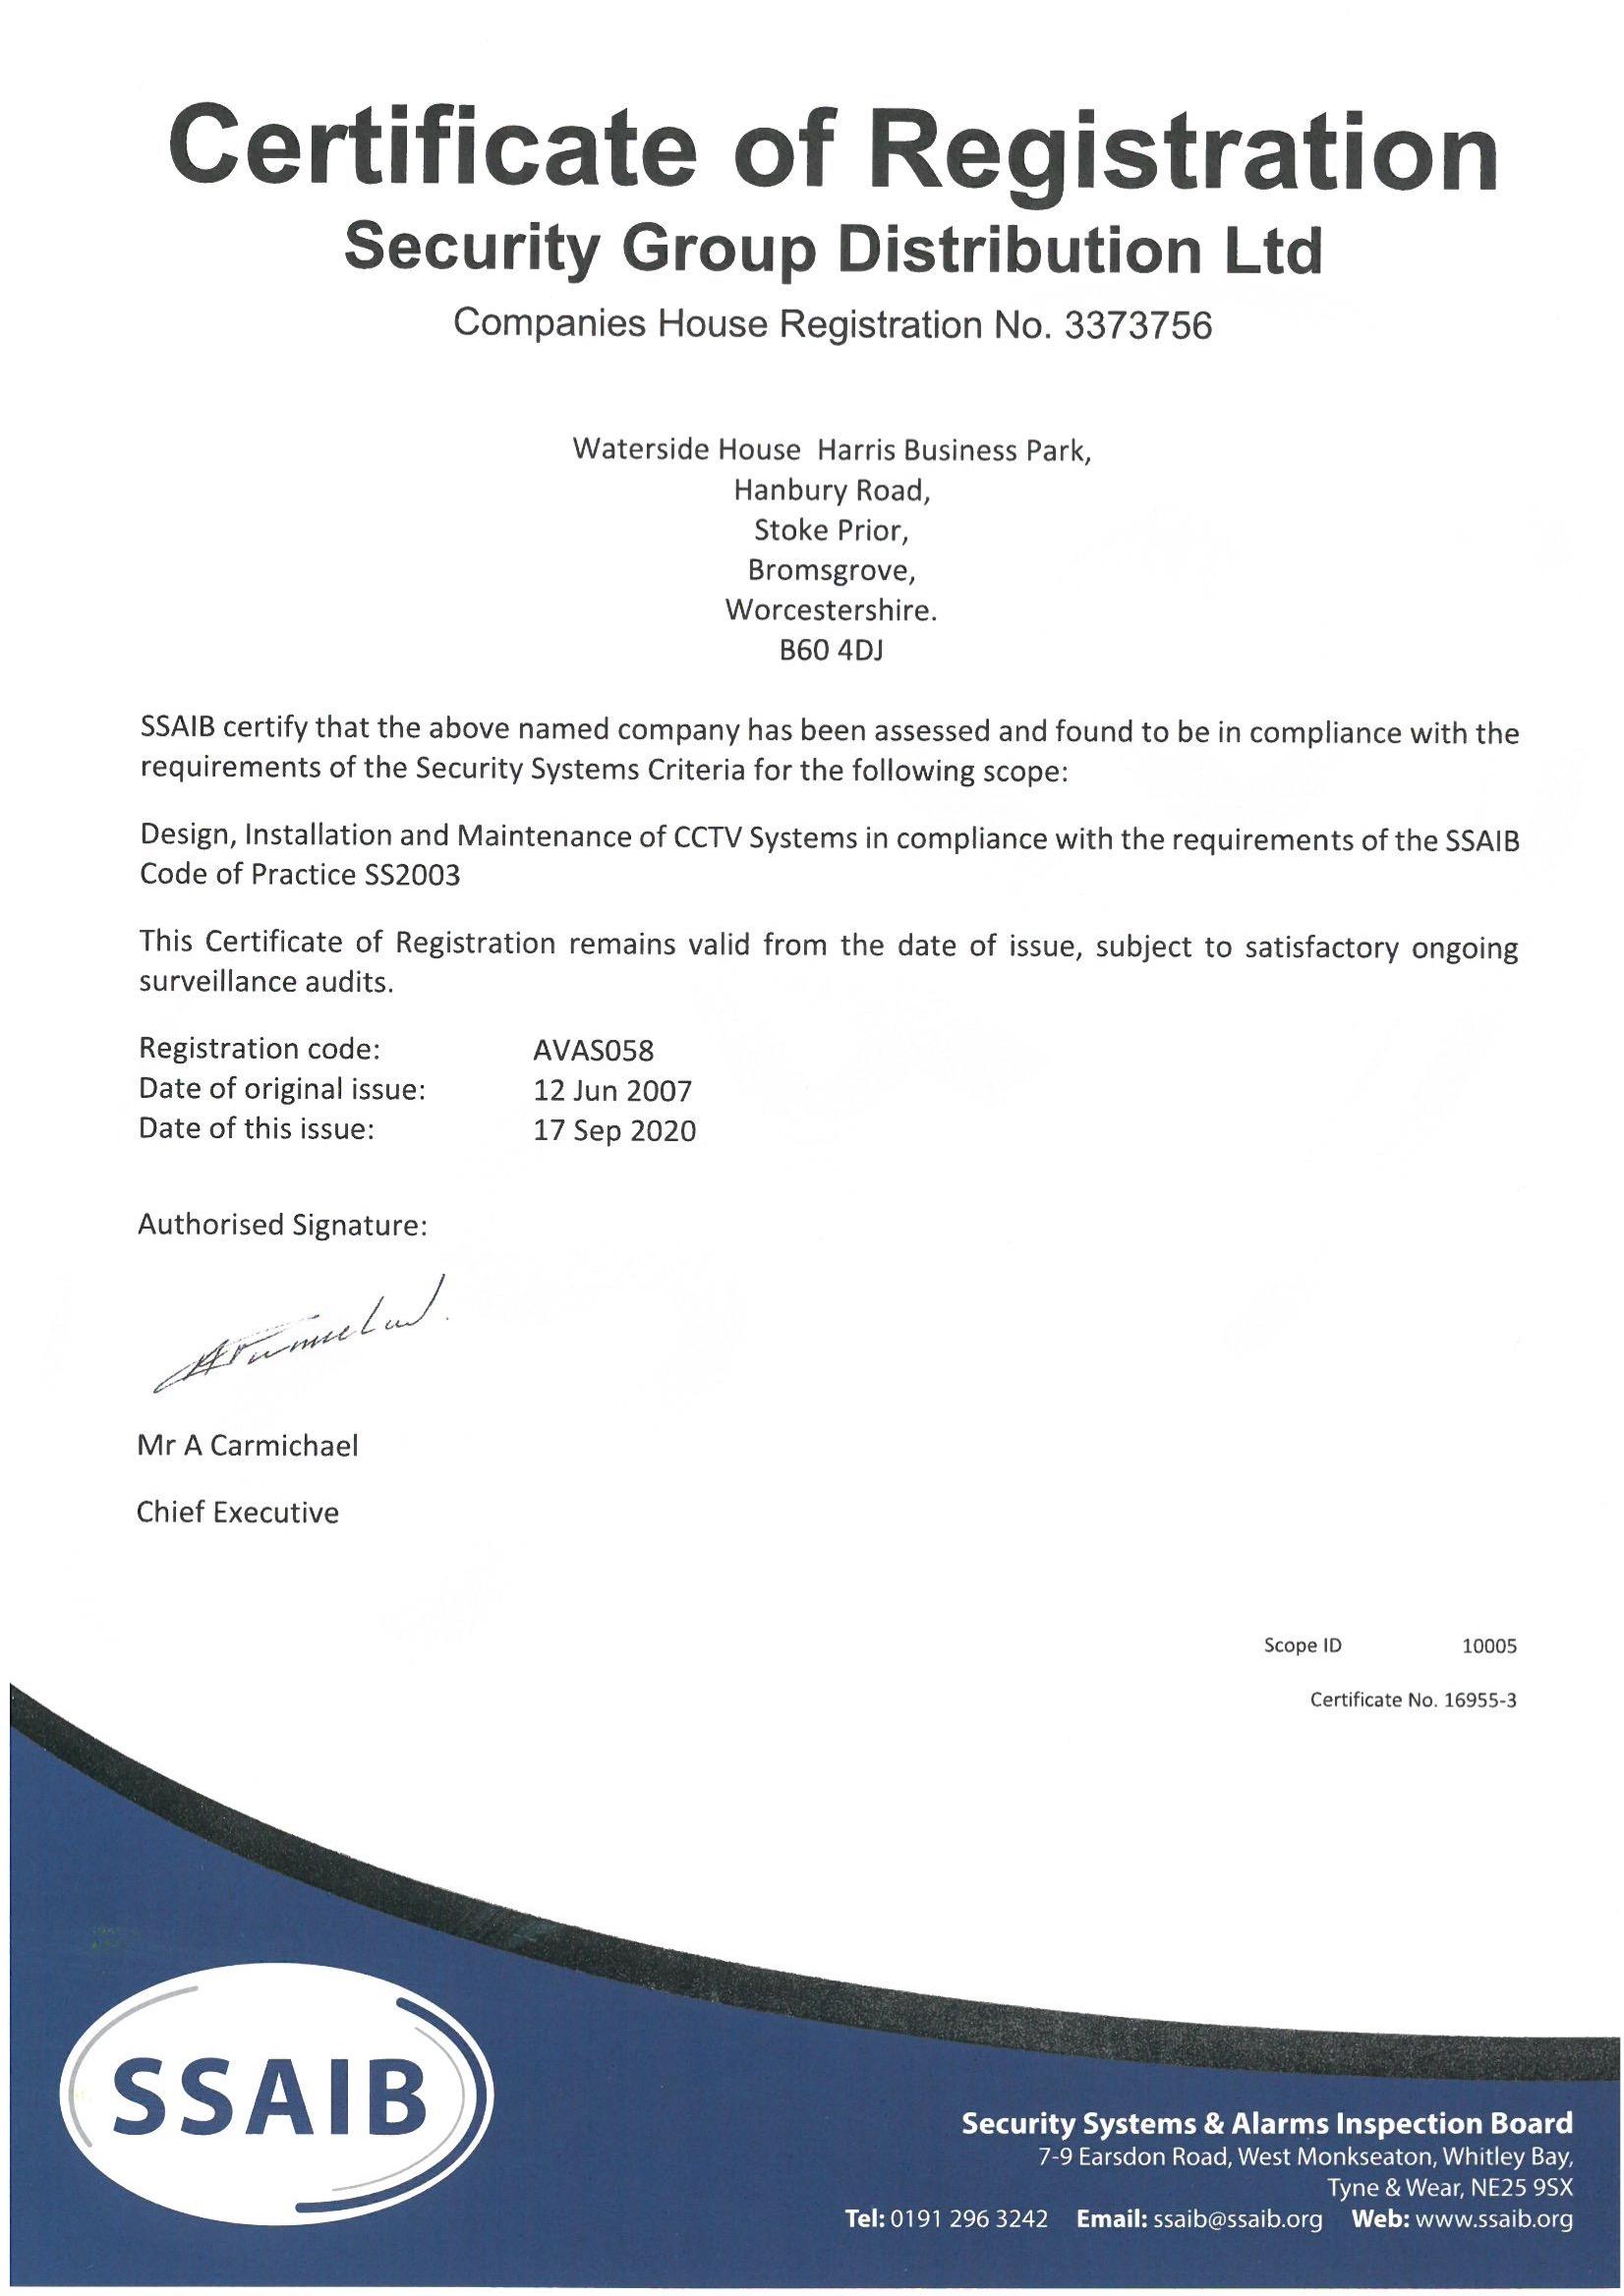 SSAIB Code of Practice SS2003 Certificate No. 16955